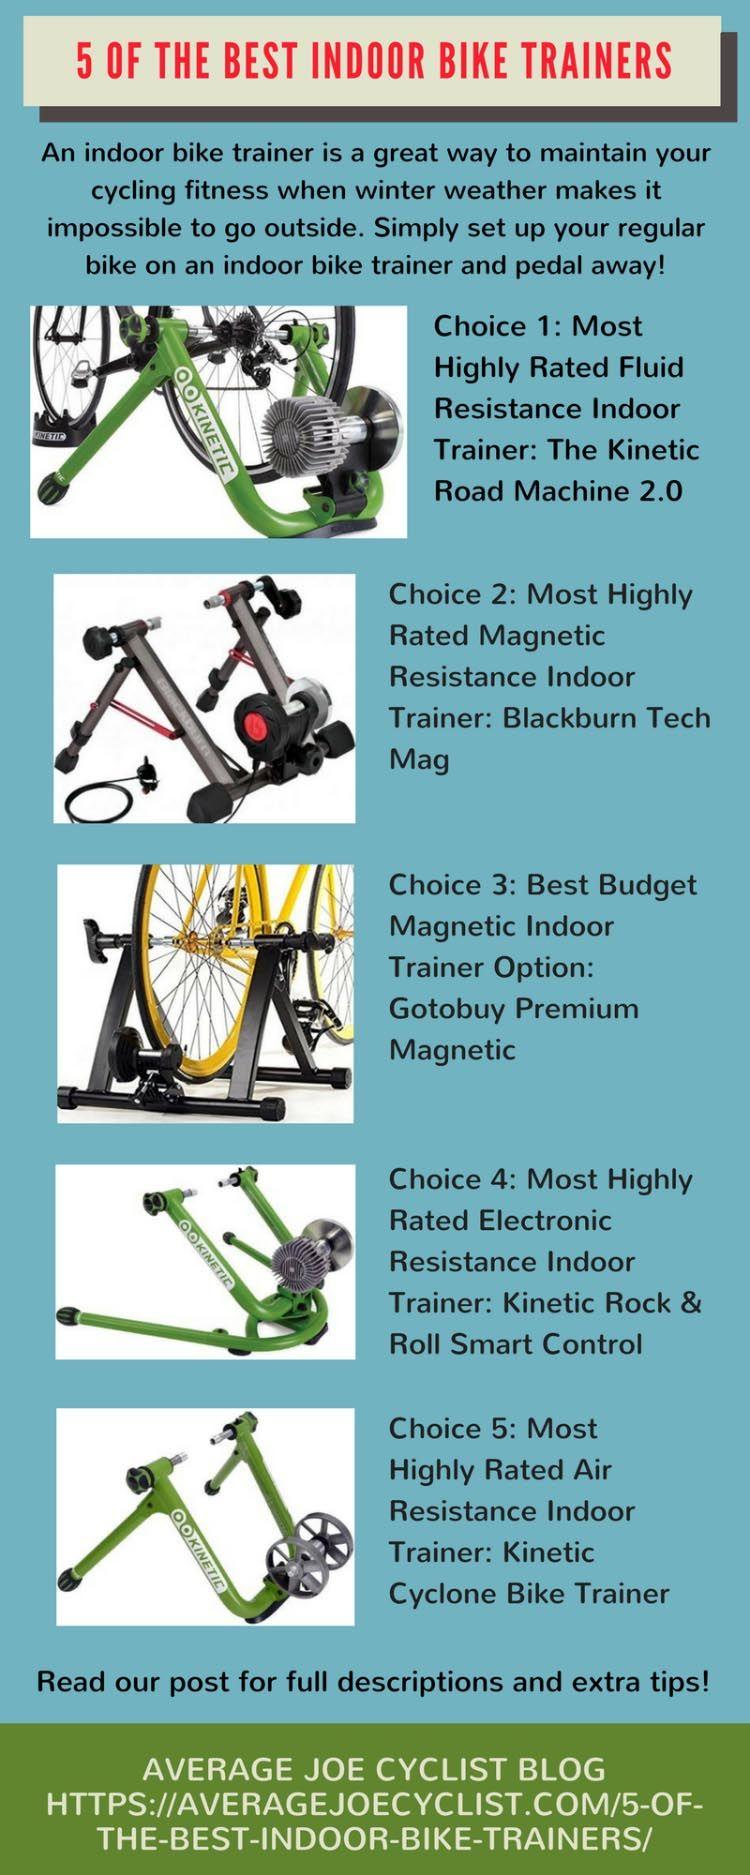 5 Of The Best Budget Indoor Bike Trainers 2020 Bike Trainer